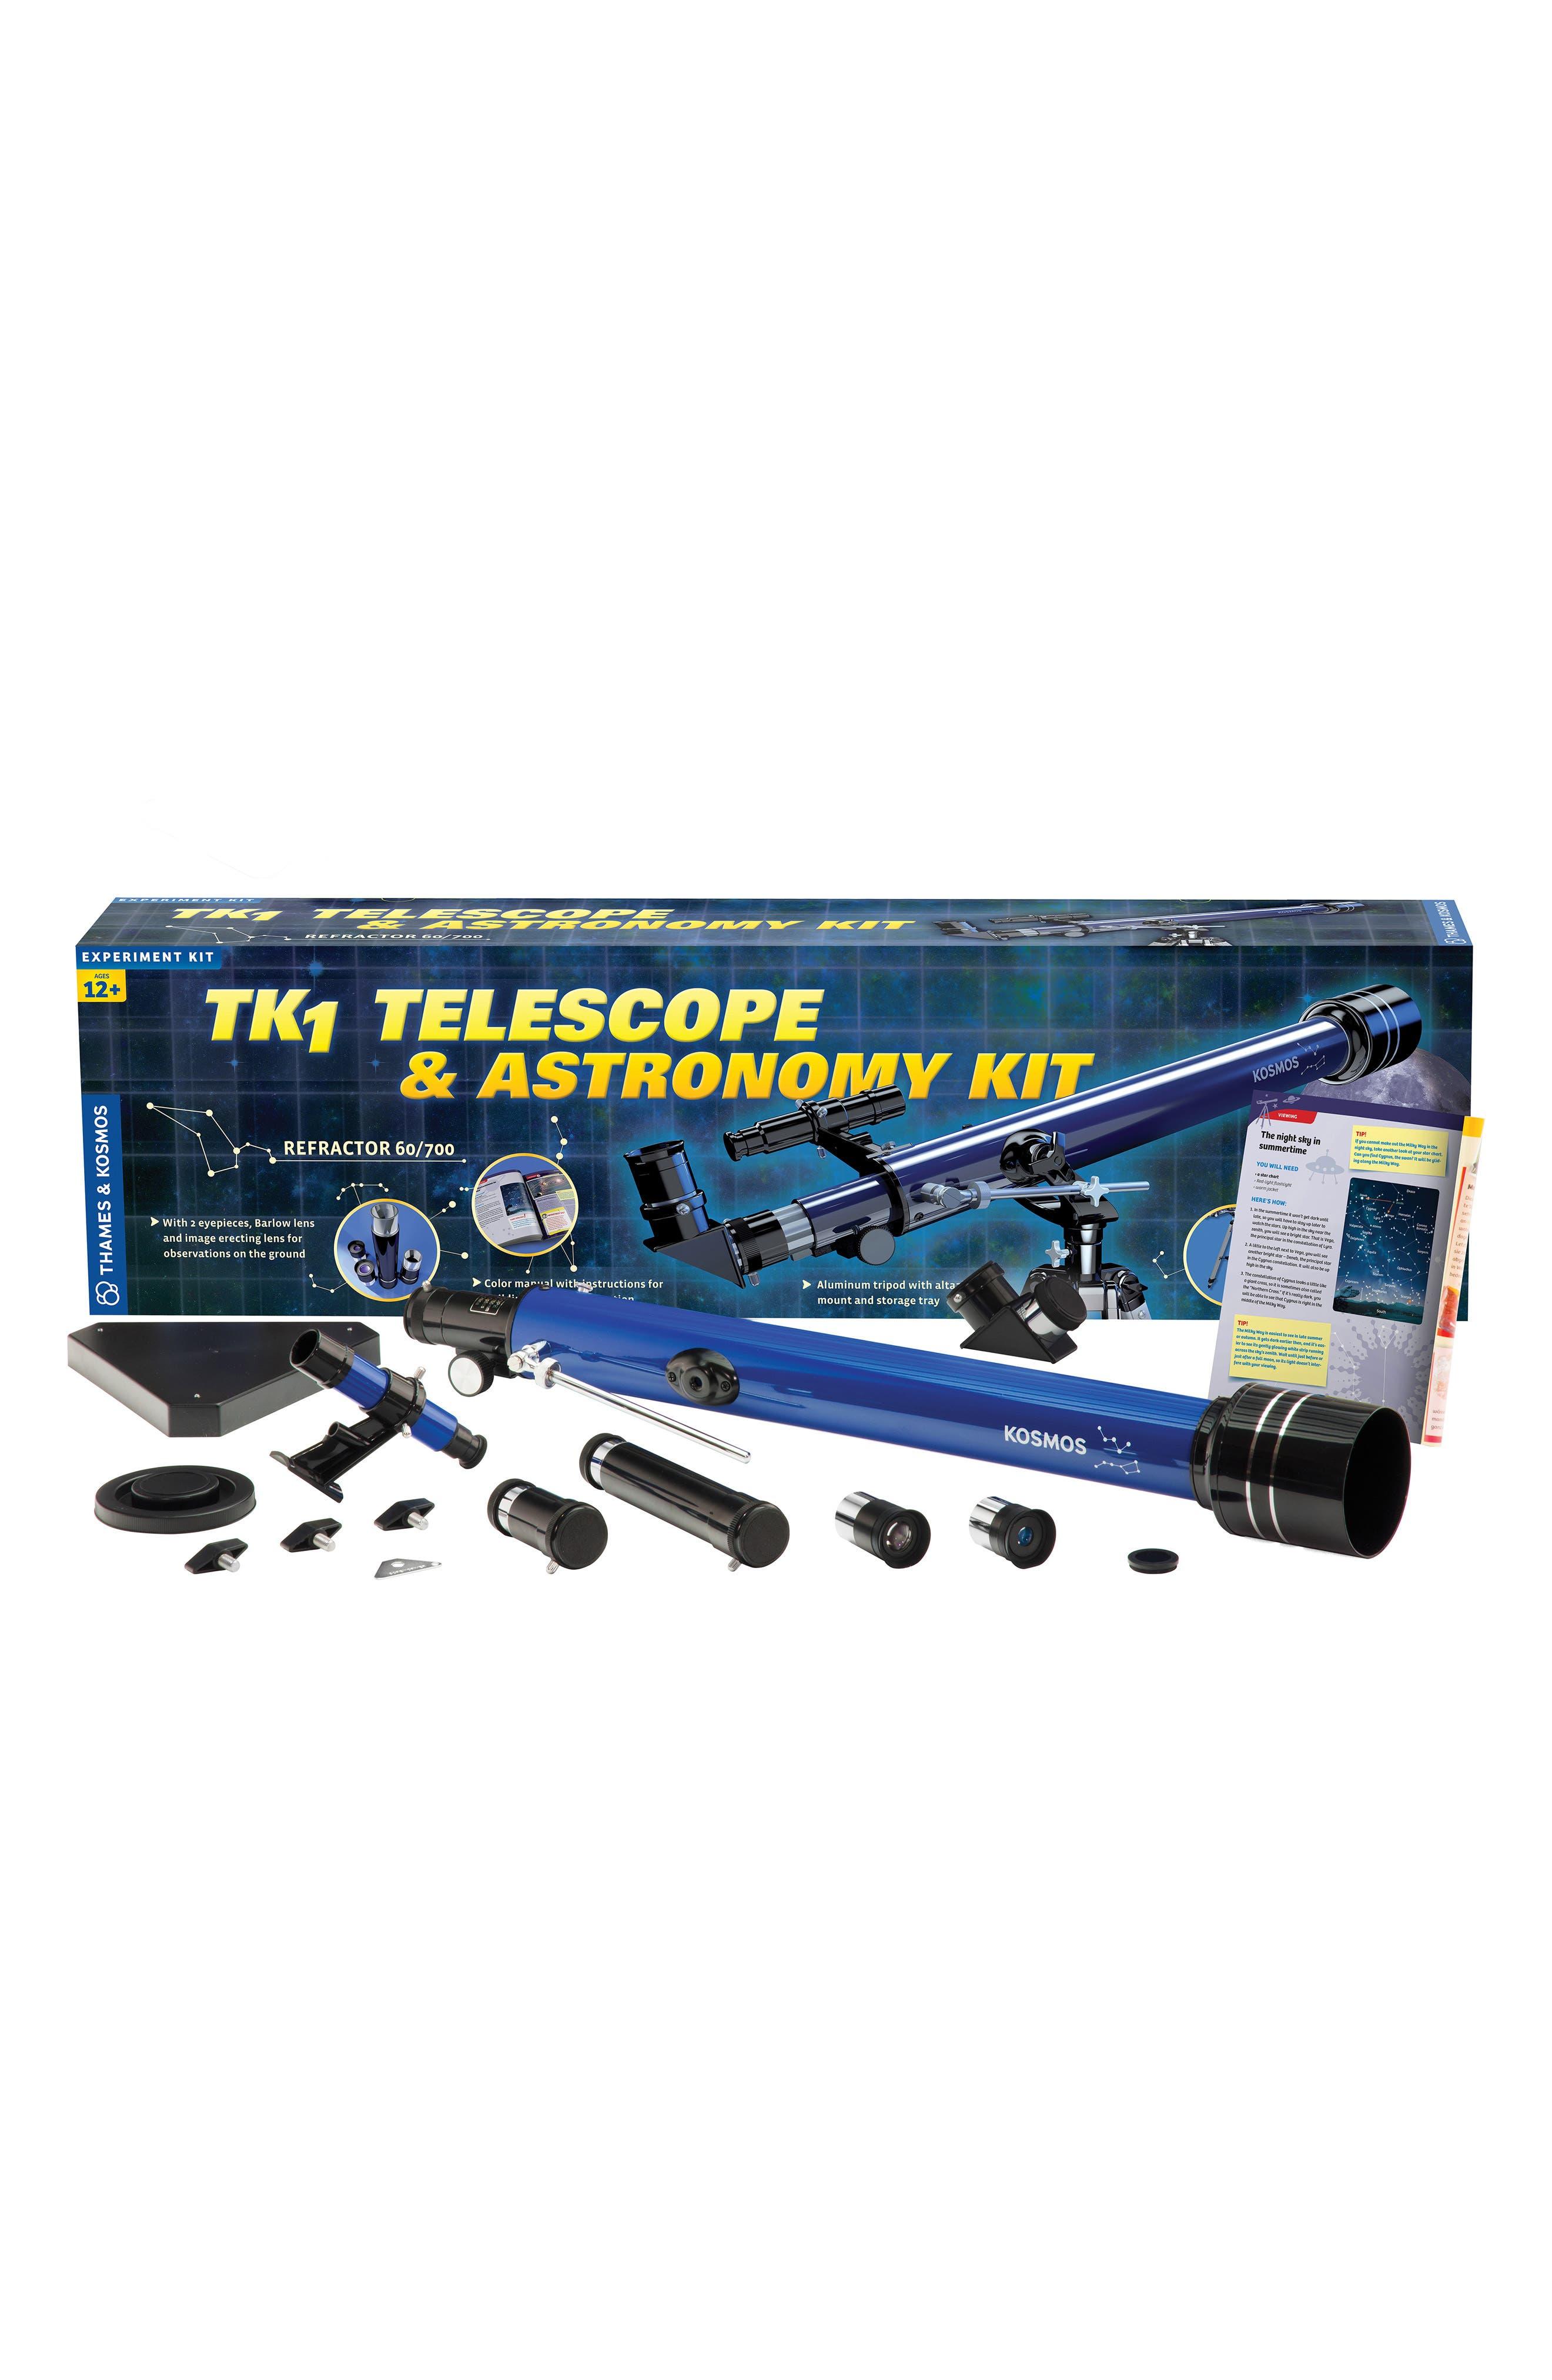 Main Image - Thames & Kosmos 'TK1' Telescope & Astronomy Kit